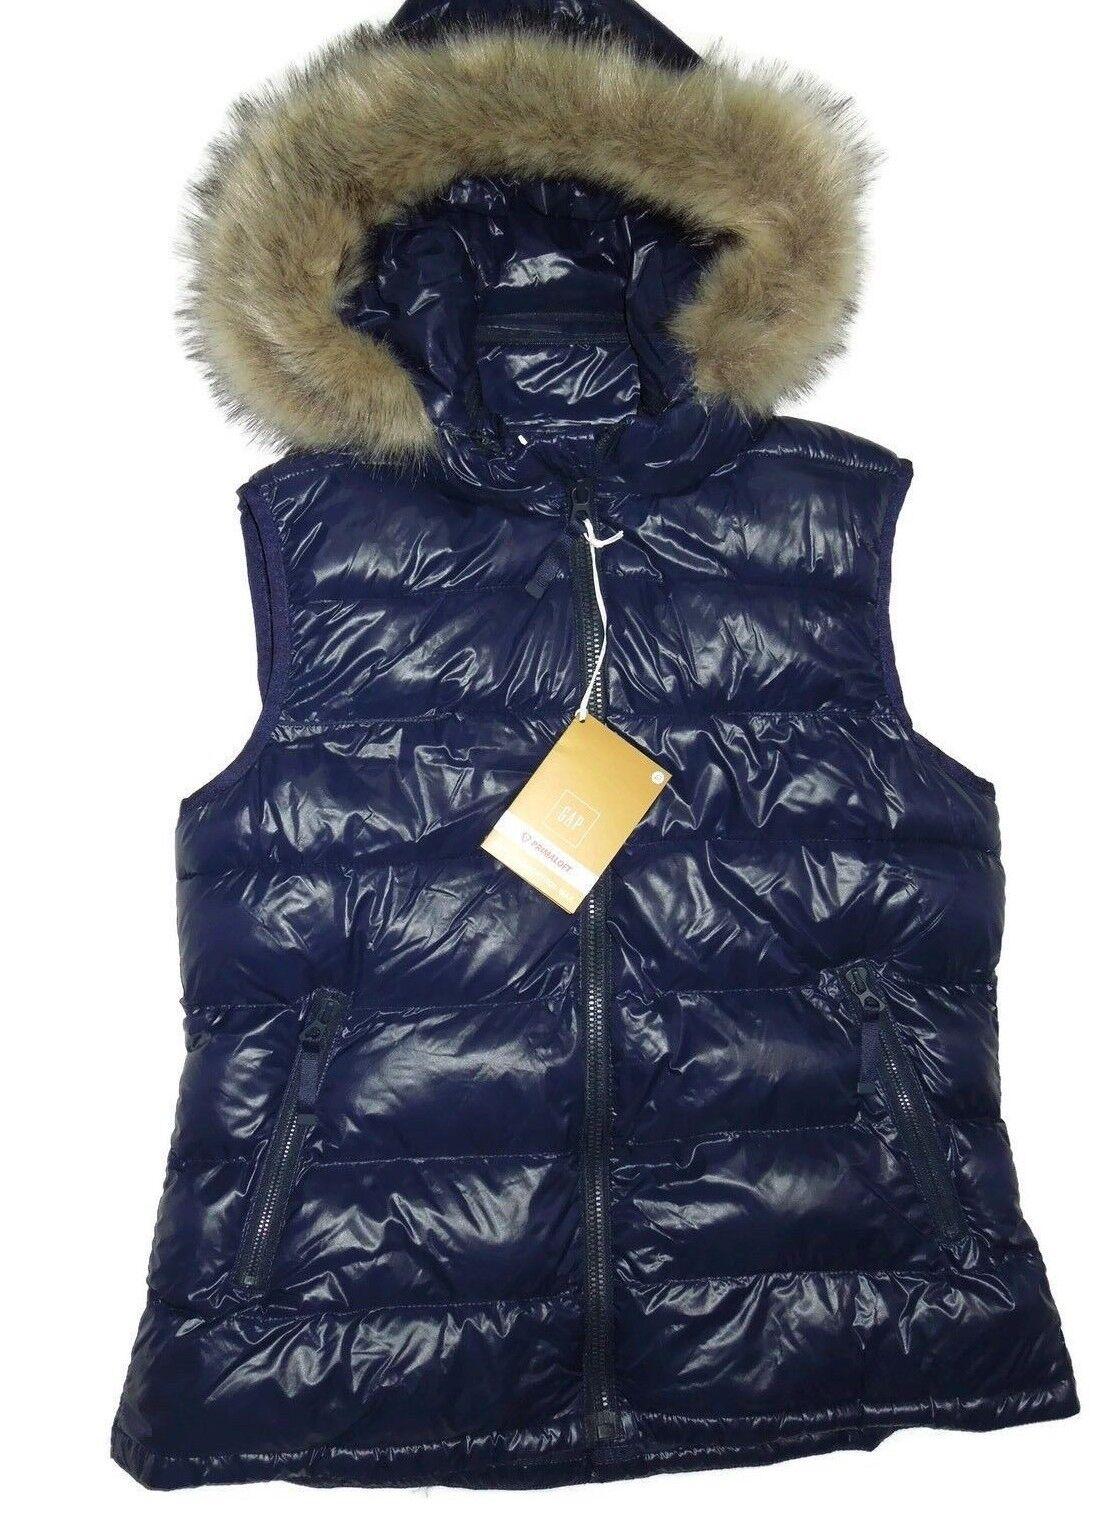 GAP women's Primaloft removable hood Navy winter Vest size Large